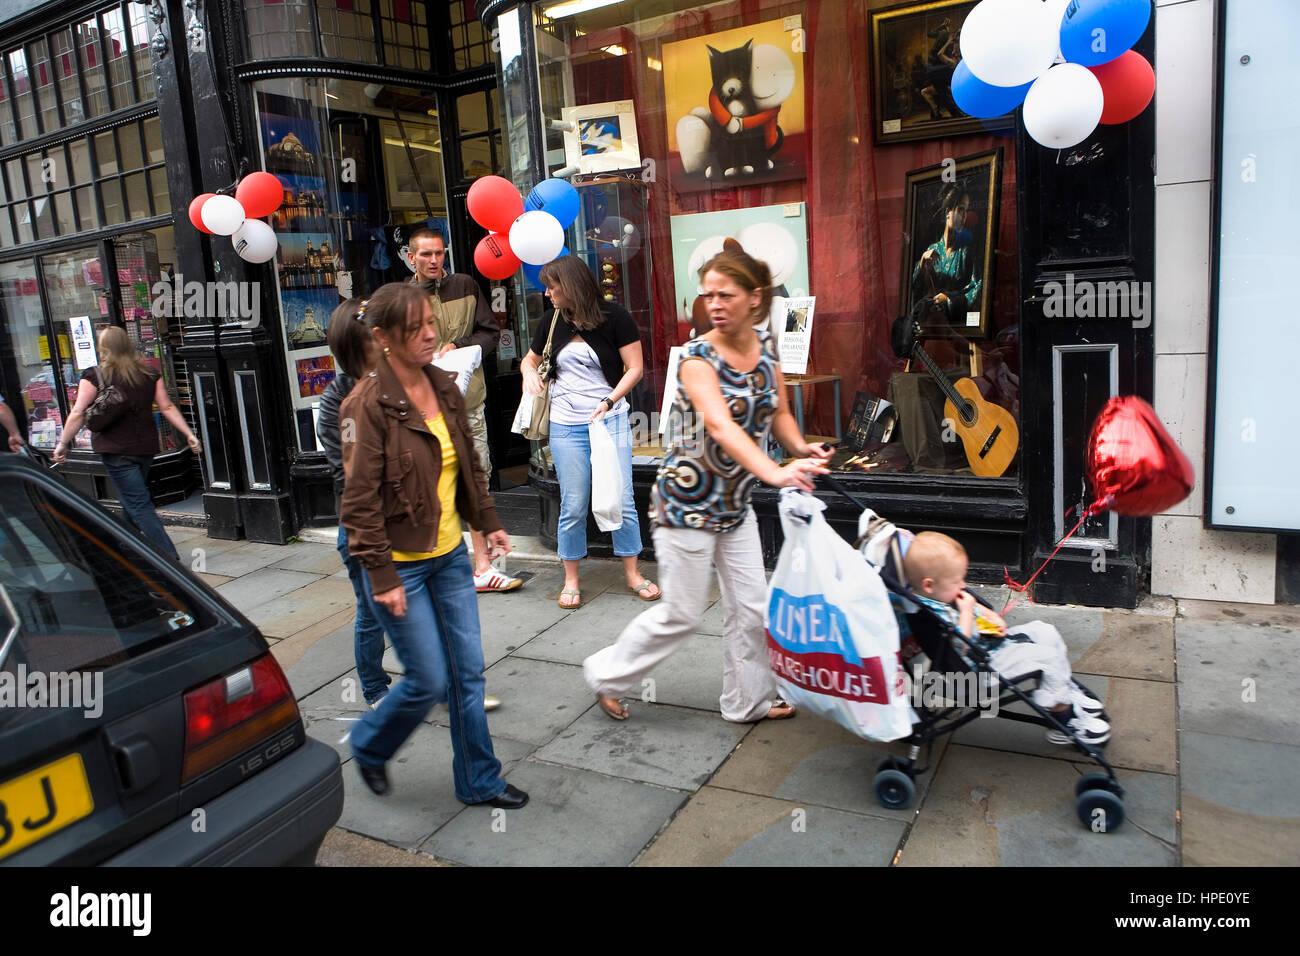 Rennies, arts & crafts. 61-63 Bold Street. Liverpool. England. UK - Stock Image